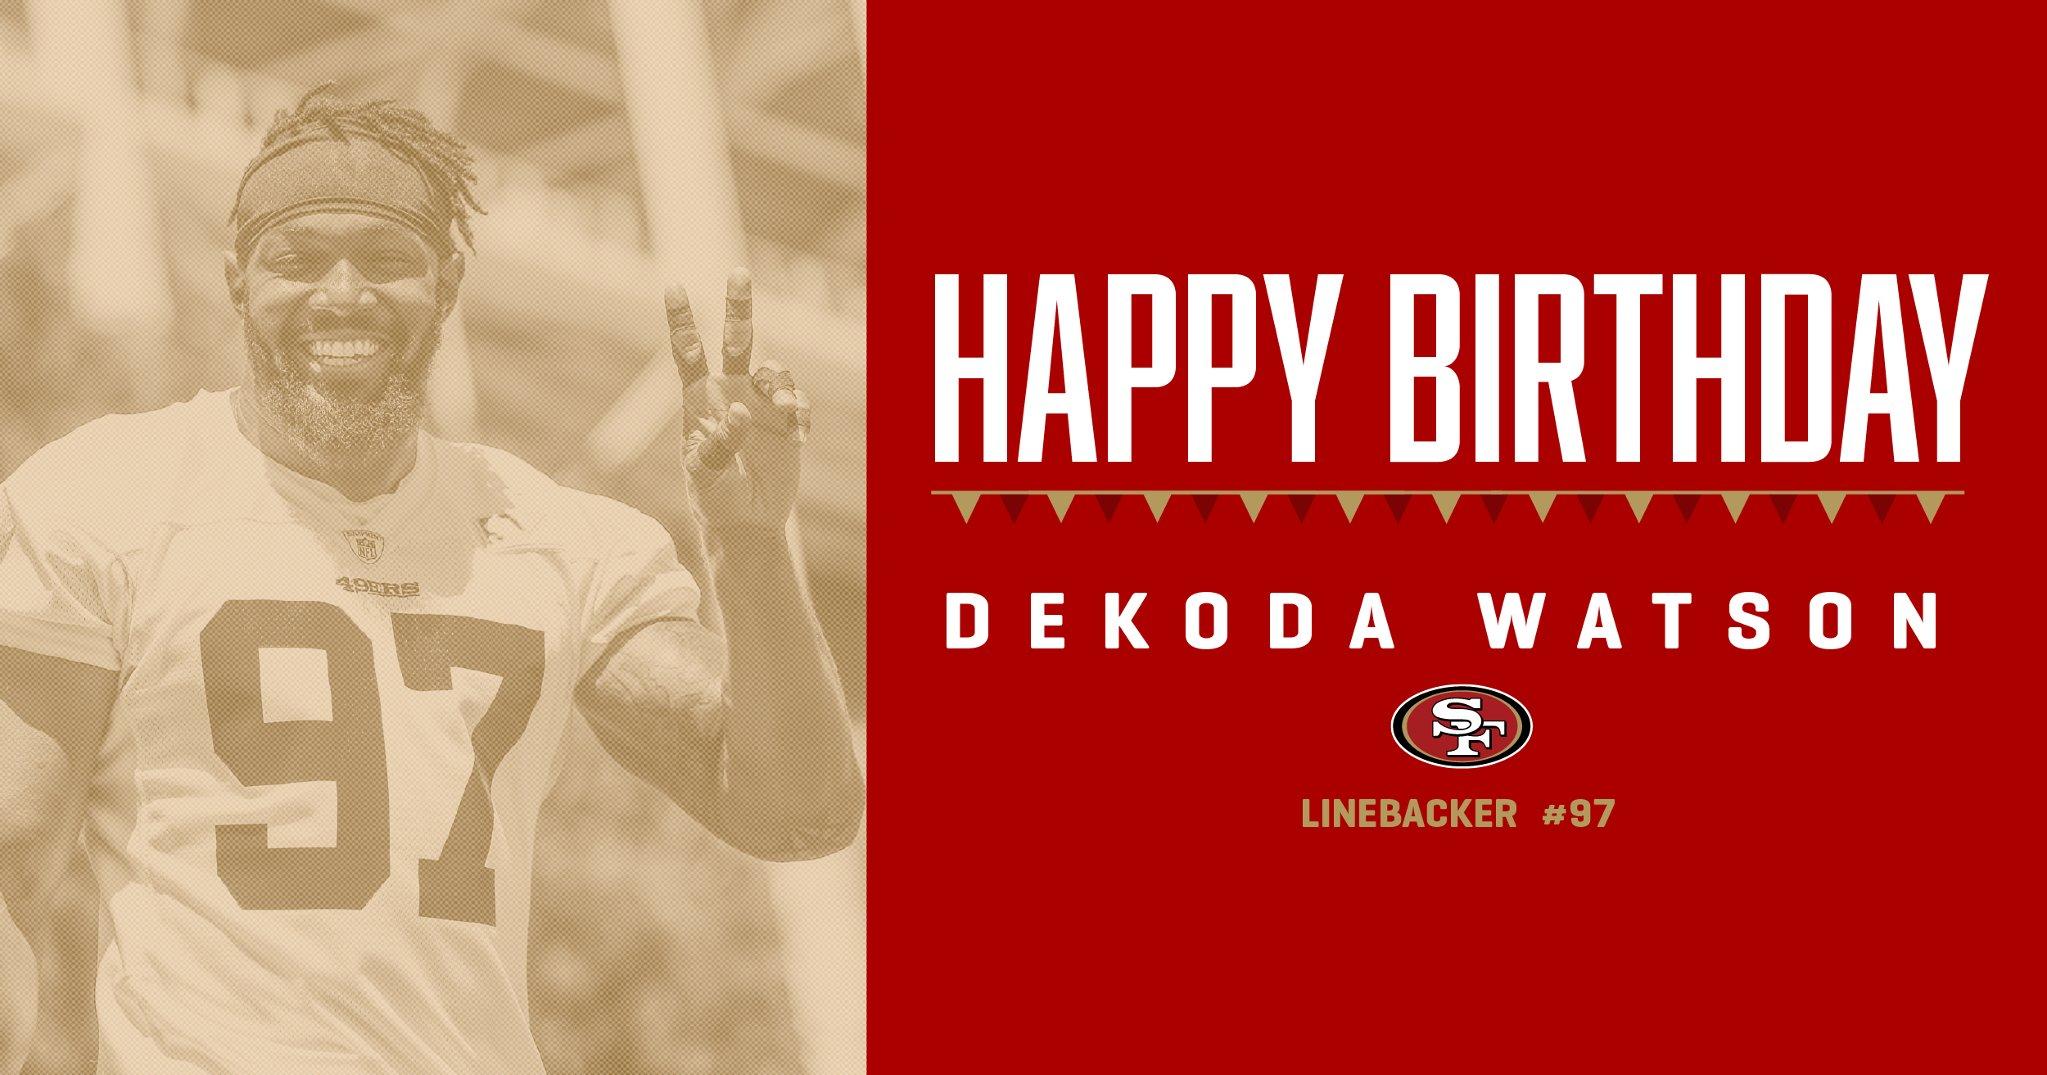 Smile it's your birthday! Have a good one @dekodawatson57 ✌�� https://t.co/d10ohVwaRZ